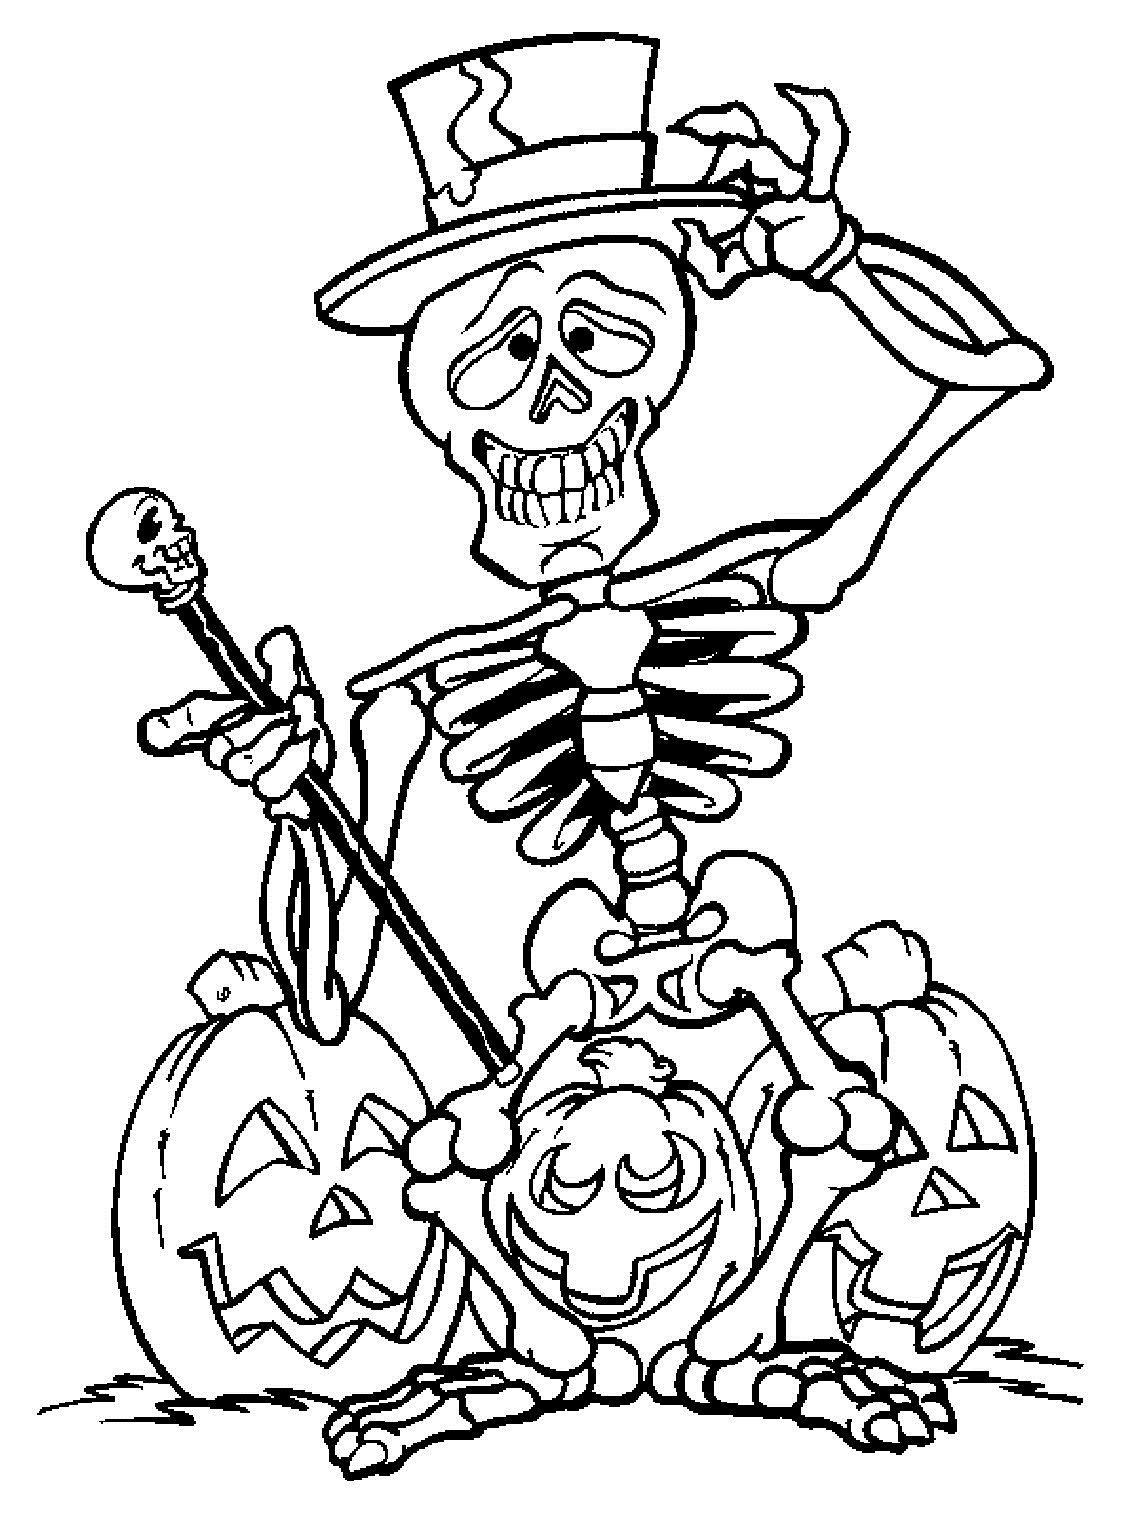 Хэллоуин и скелет - razukrashki.com